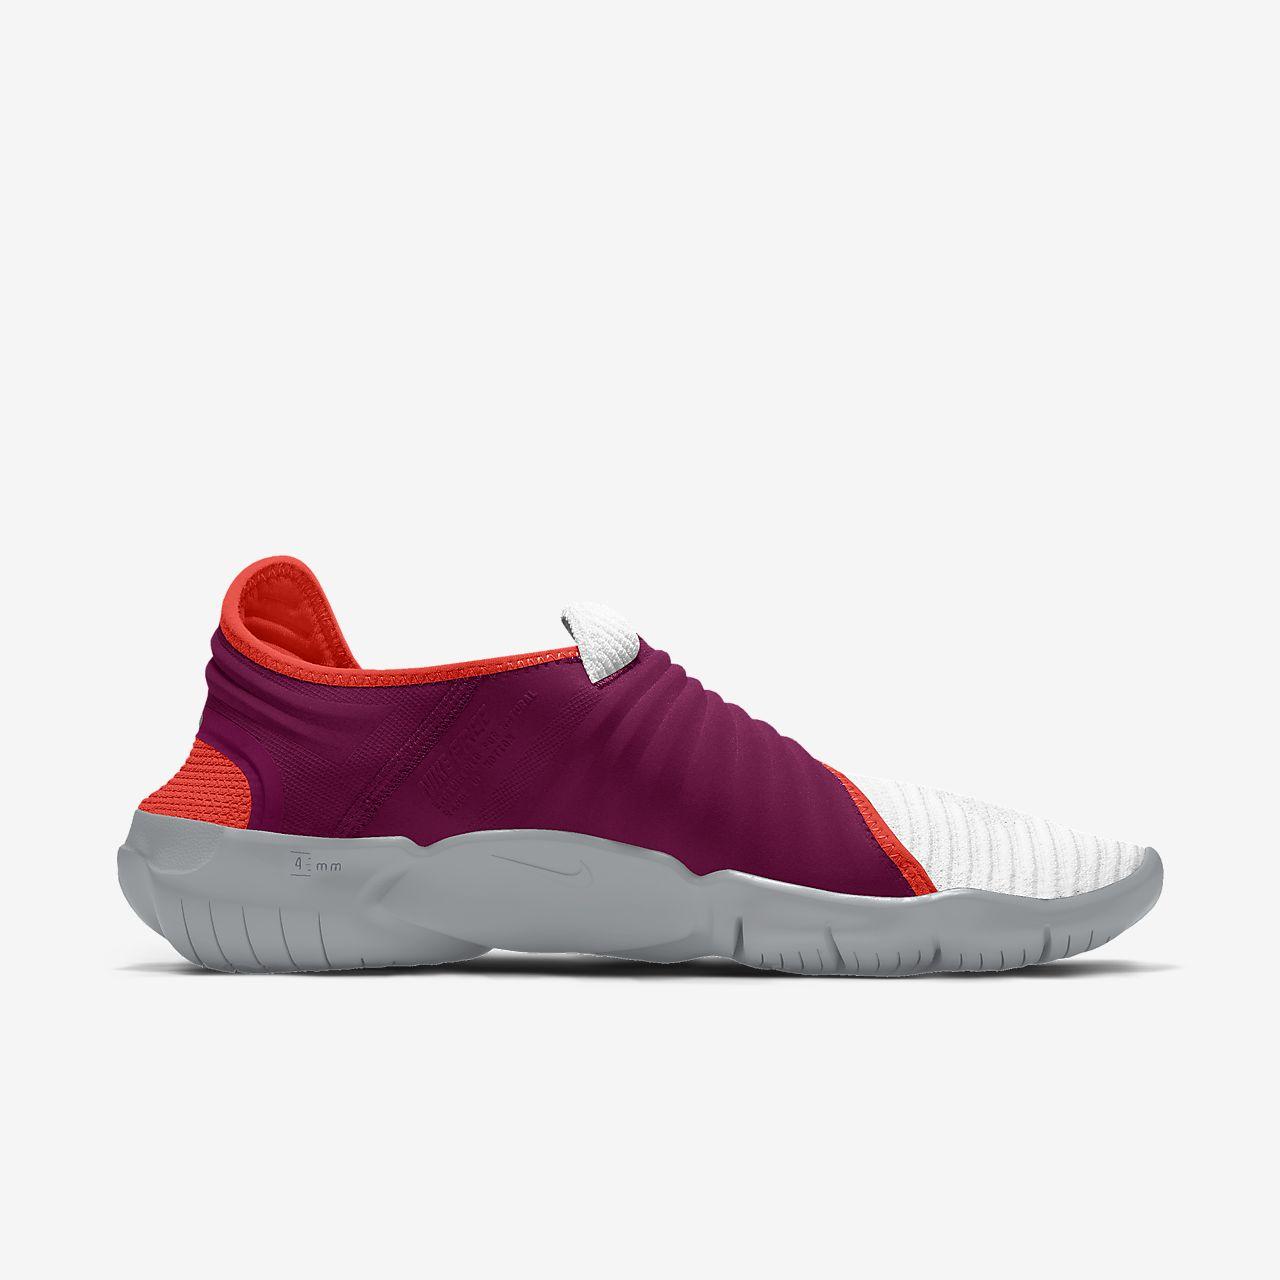 Nike Free RN 5.0 By You ppersonalisierbarer Damen Laufschuh